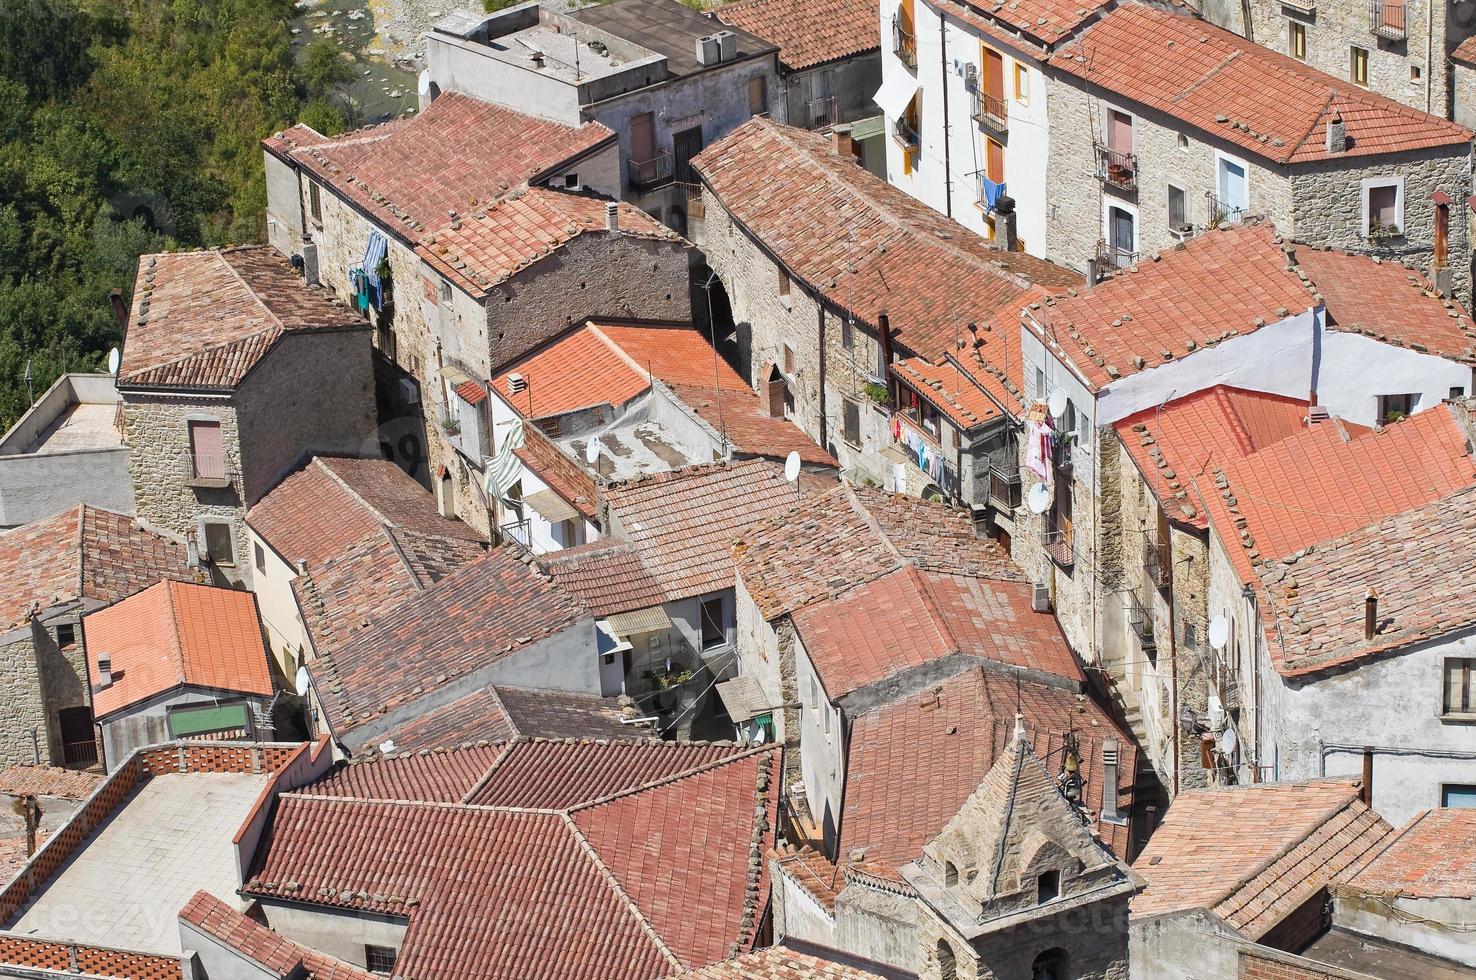 panoramisch uitzicht op valsinni. basilicata. Italië. foto